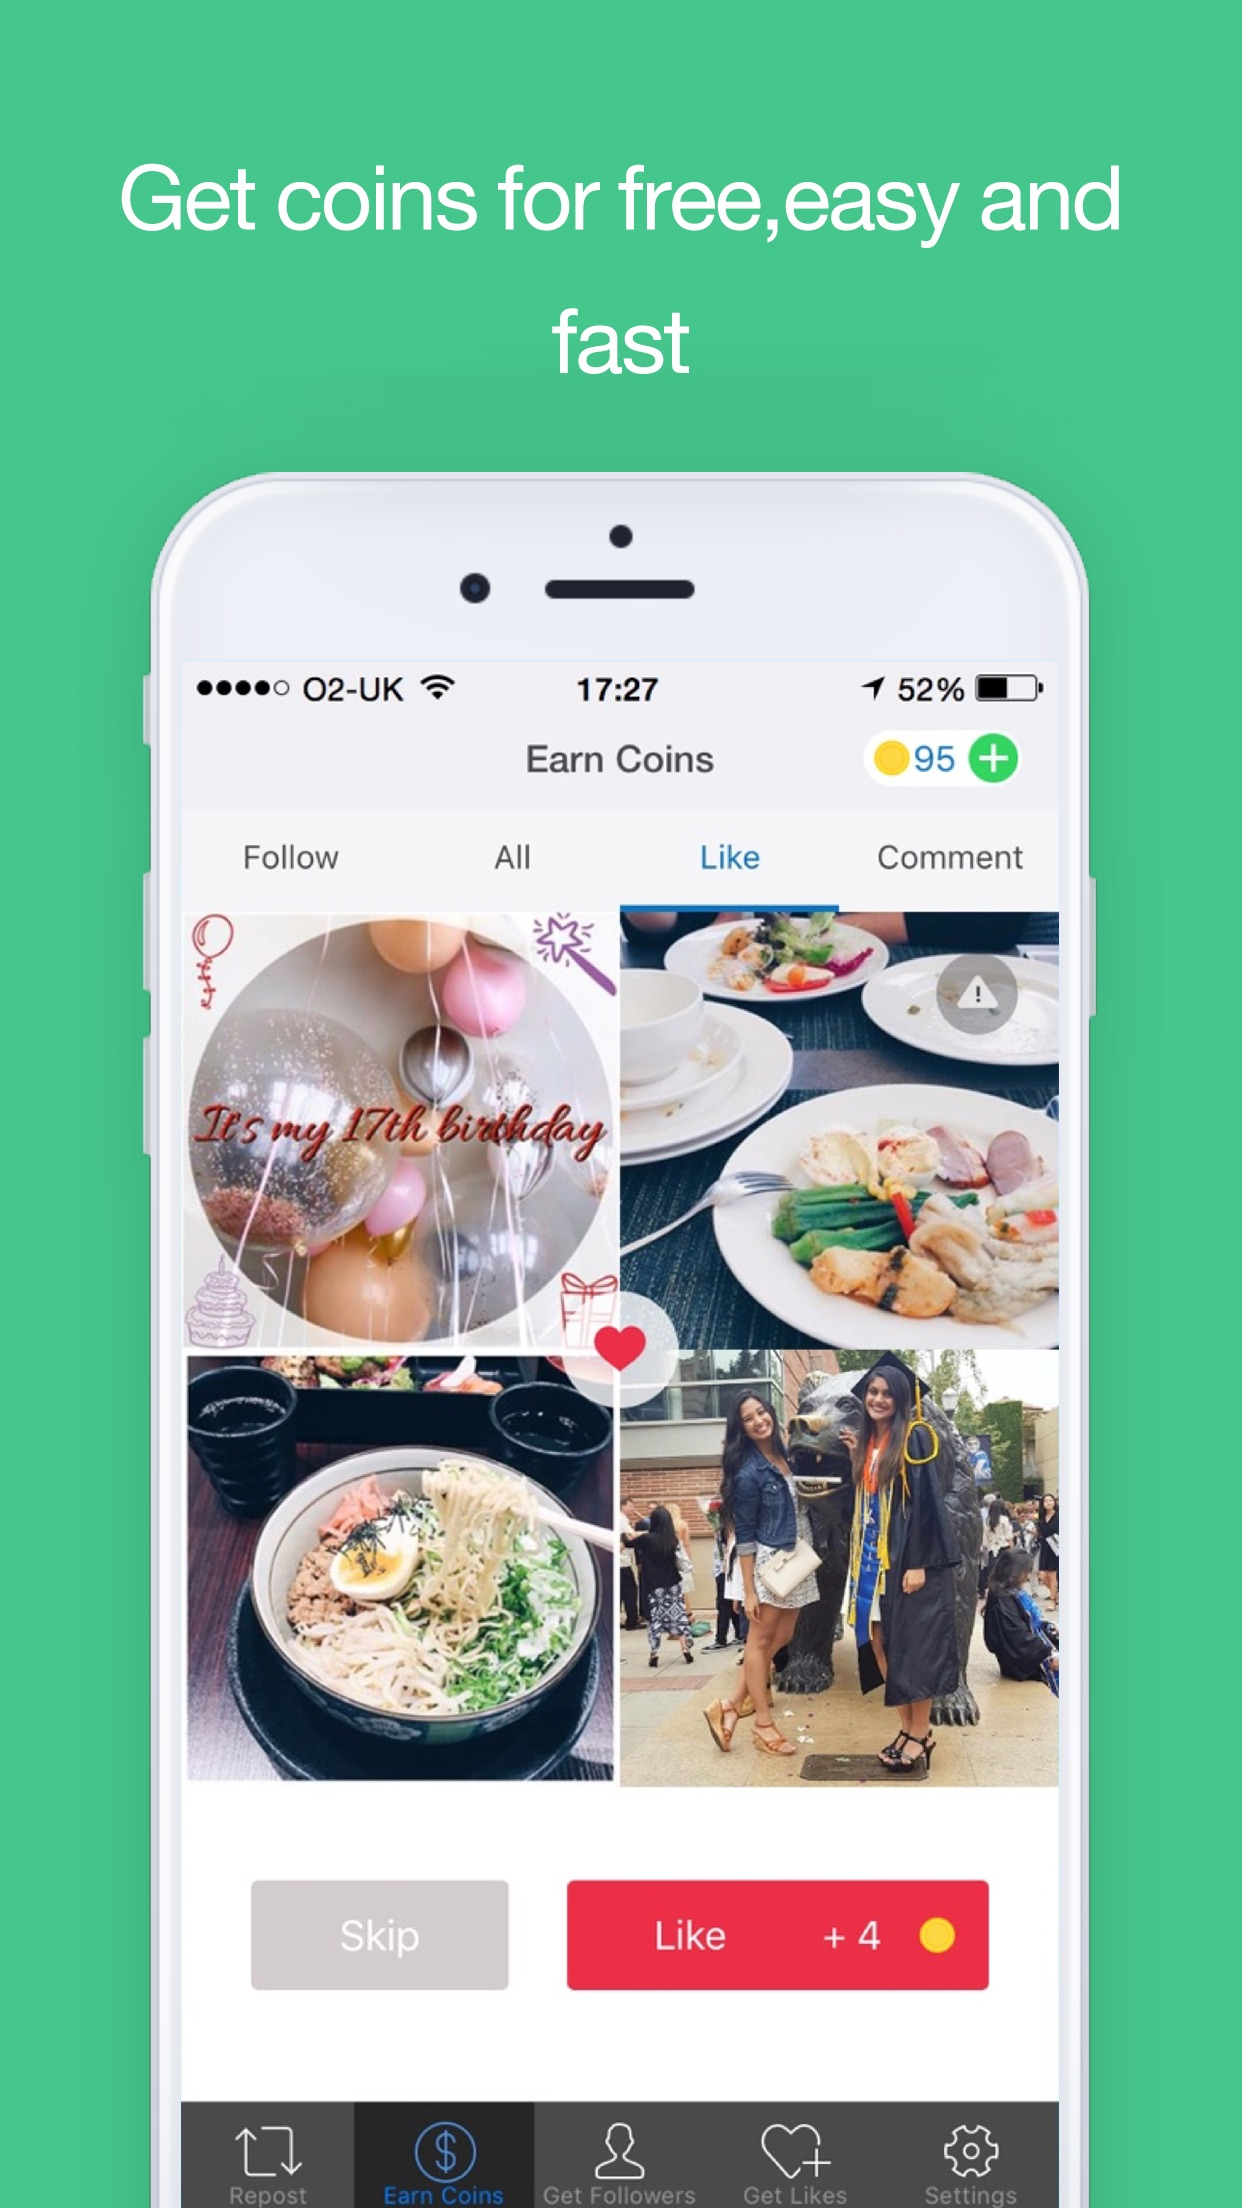 Repost for Instagram - Repost Photos & Videos Free Screenshot